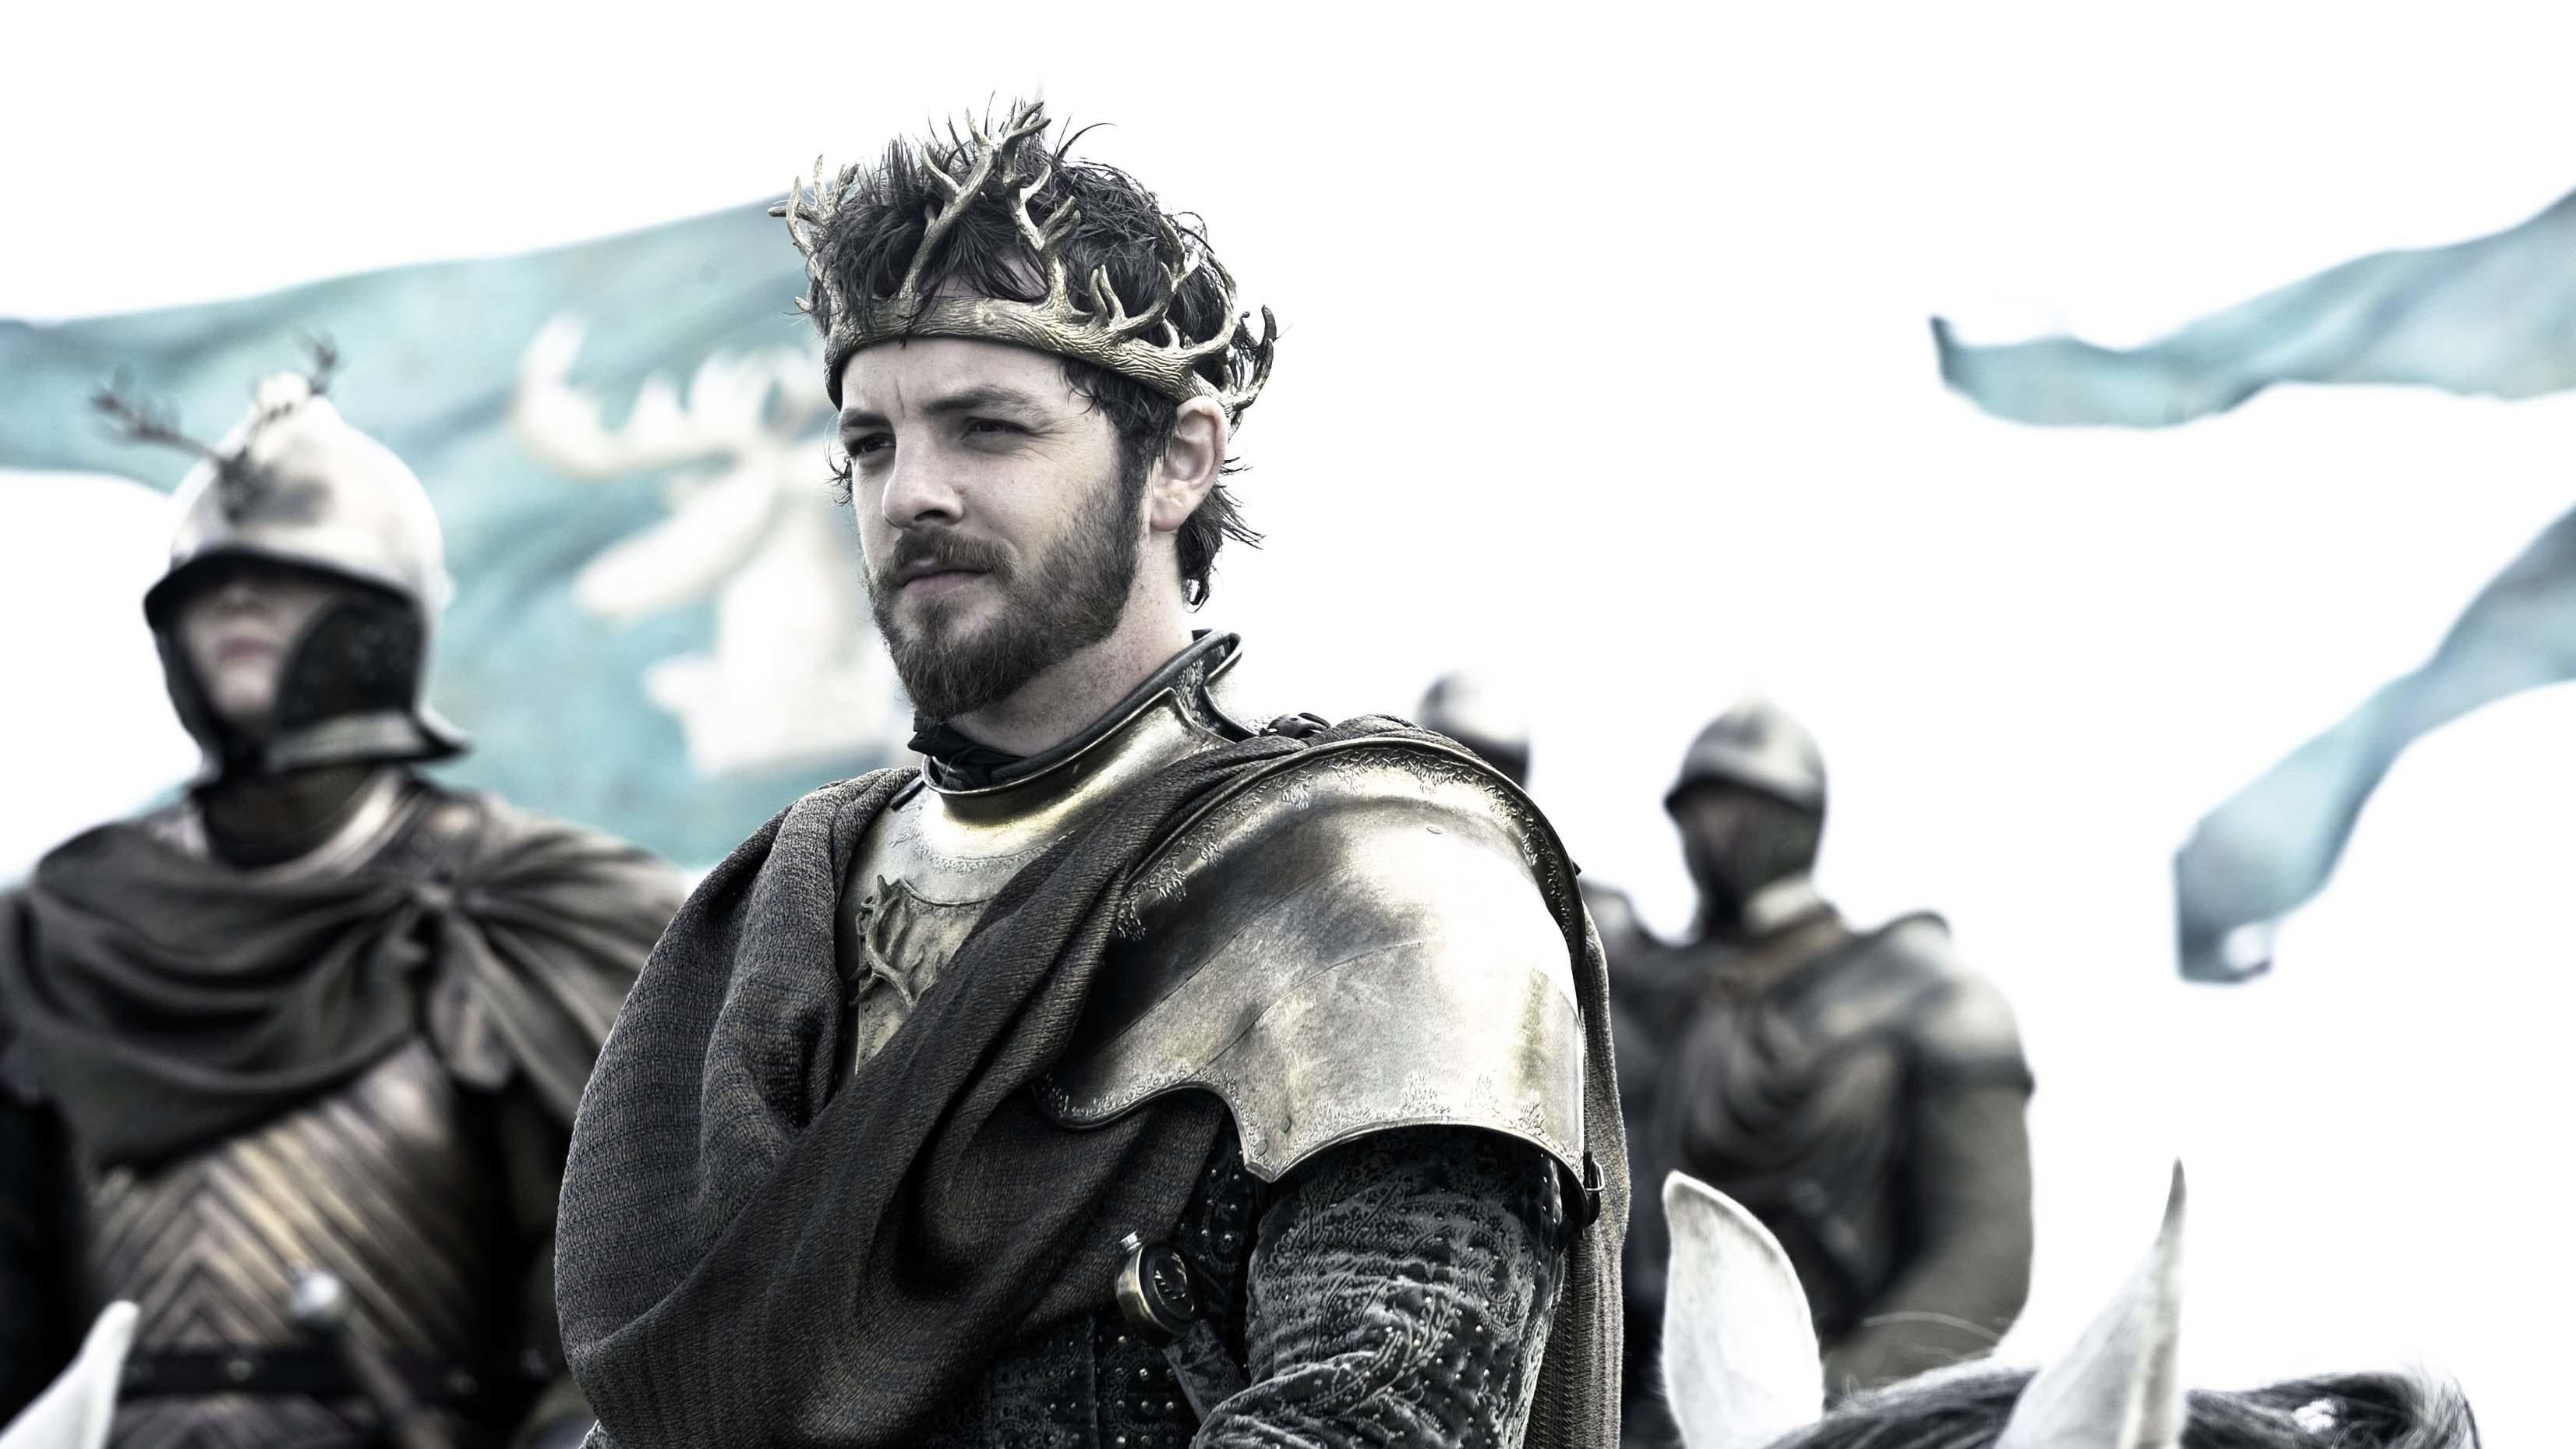 Game Of Thrones Season 2x4 Garden Of Bones Watch Online Free Moviesrox